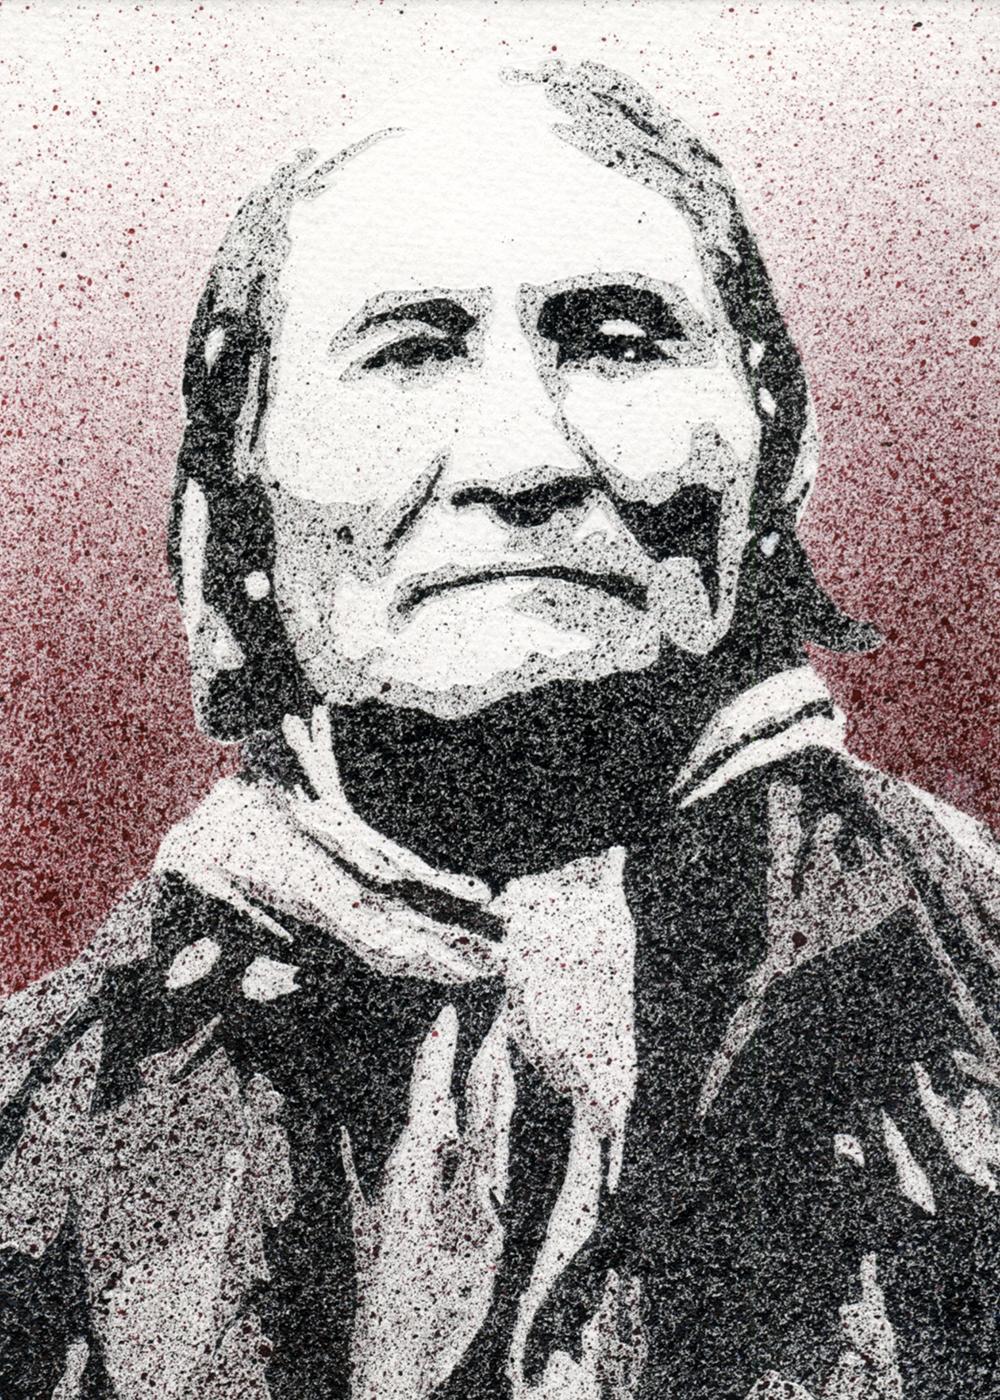 Geroninmo